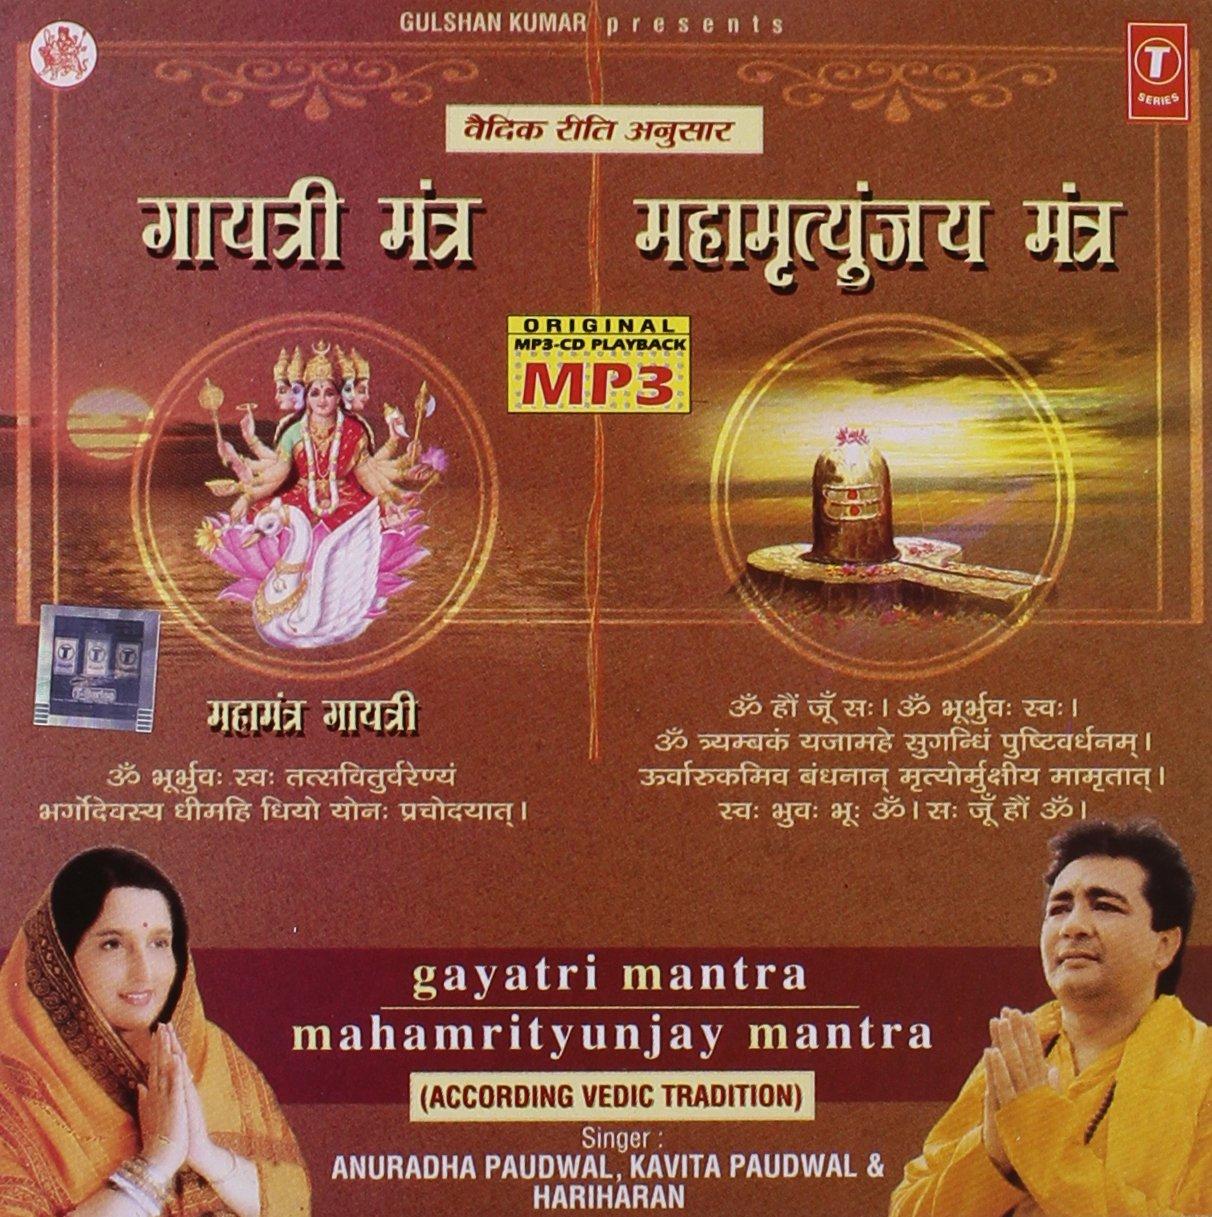 Mahamrityunjaya Mantra Mp3 Download - livincolorado